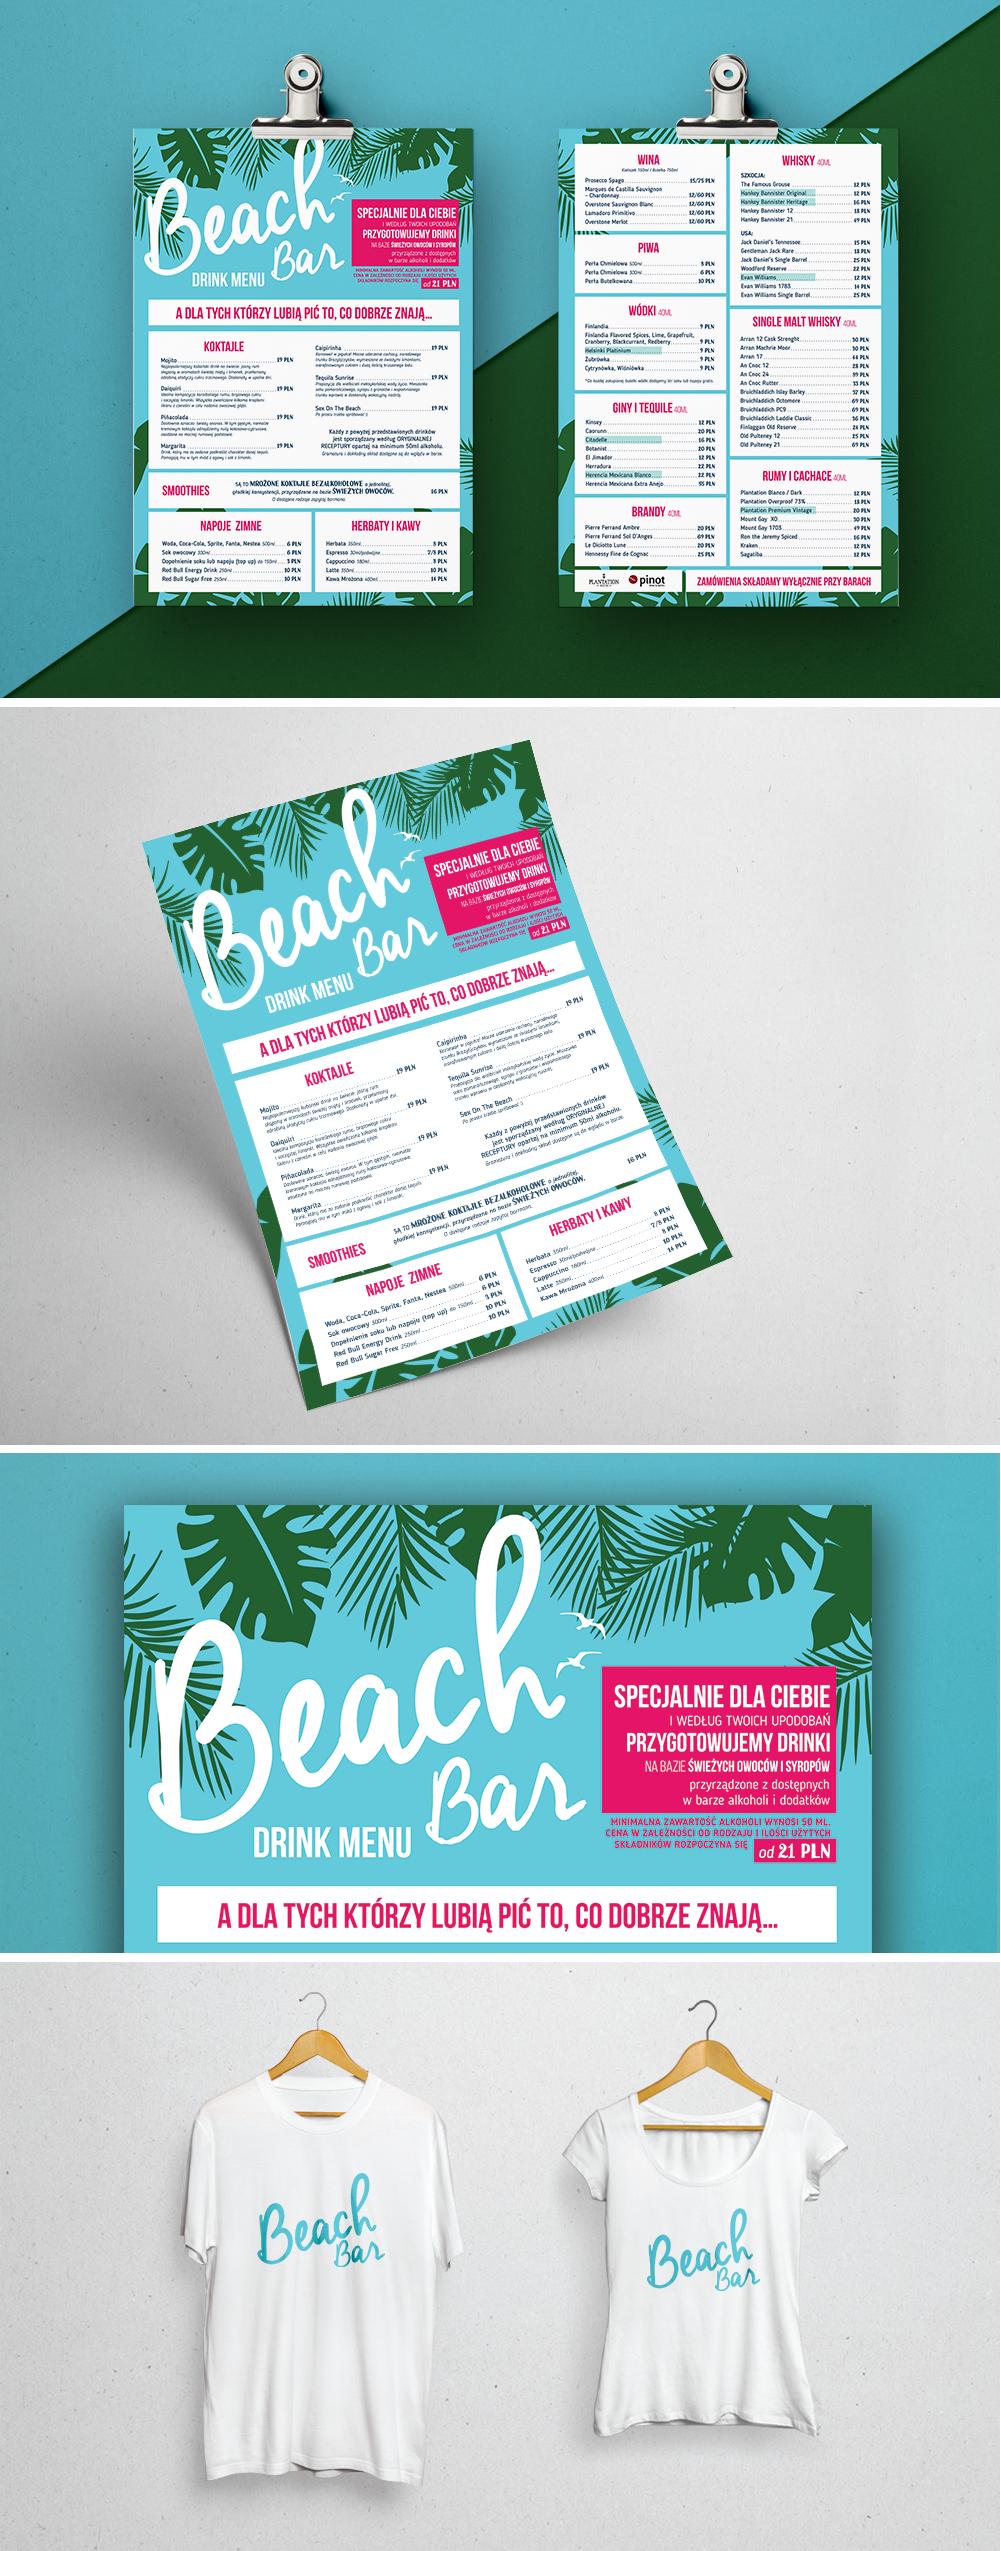 Drink Menu Dla Beach Bar Manufaktura